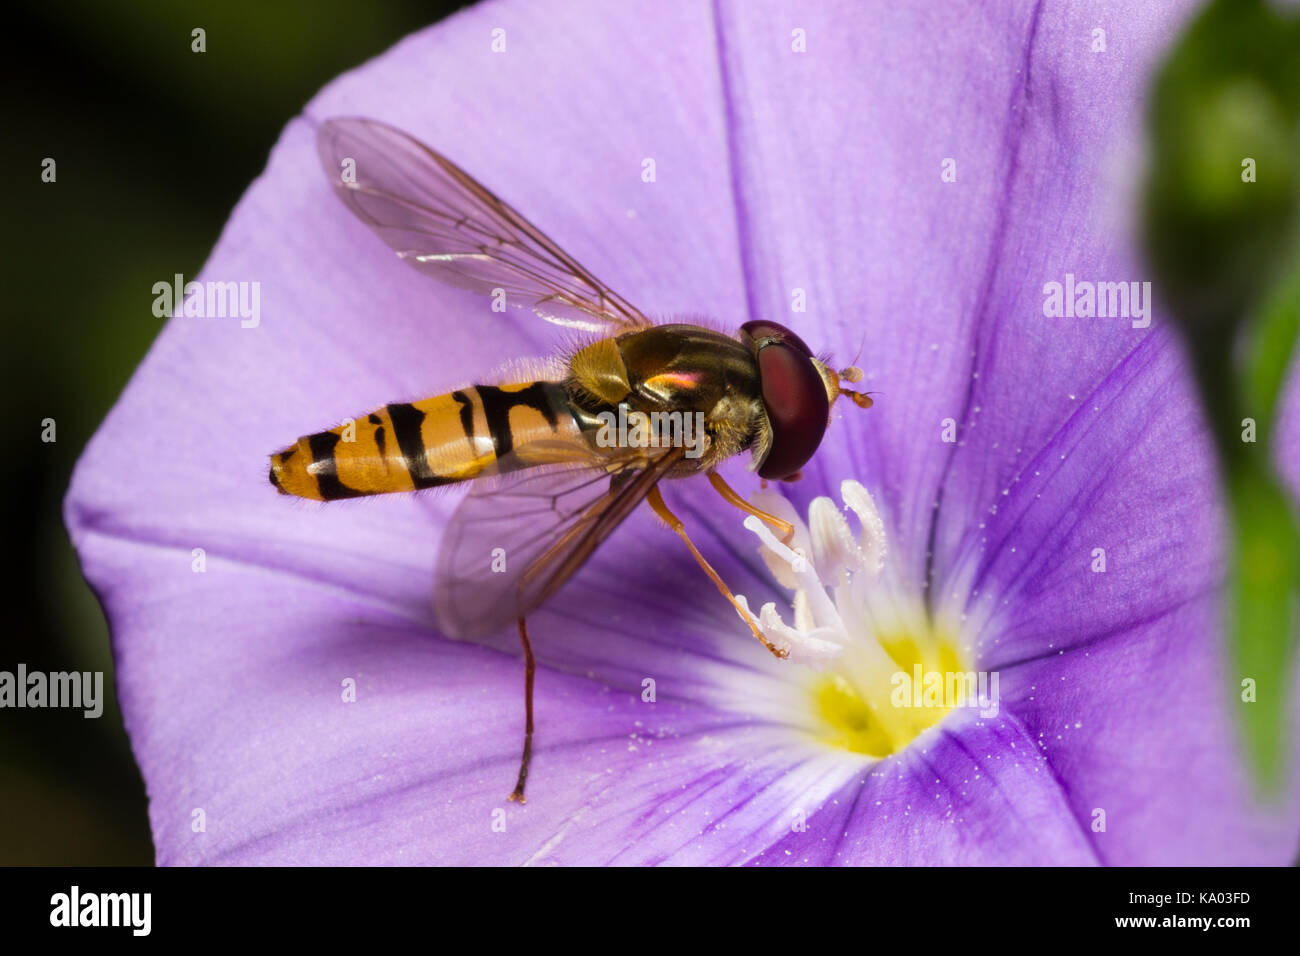 Wasp mimic UK male marmalade hoverfly, Episyrphus balteatus, feeding on the blue flower of Convolvulus sabatius - Stock Image